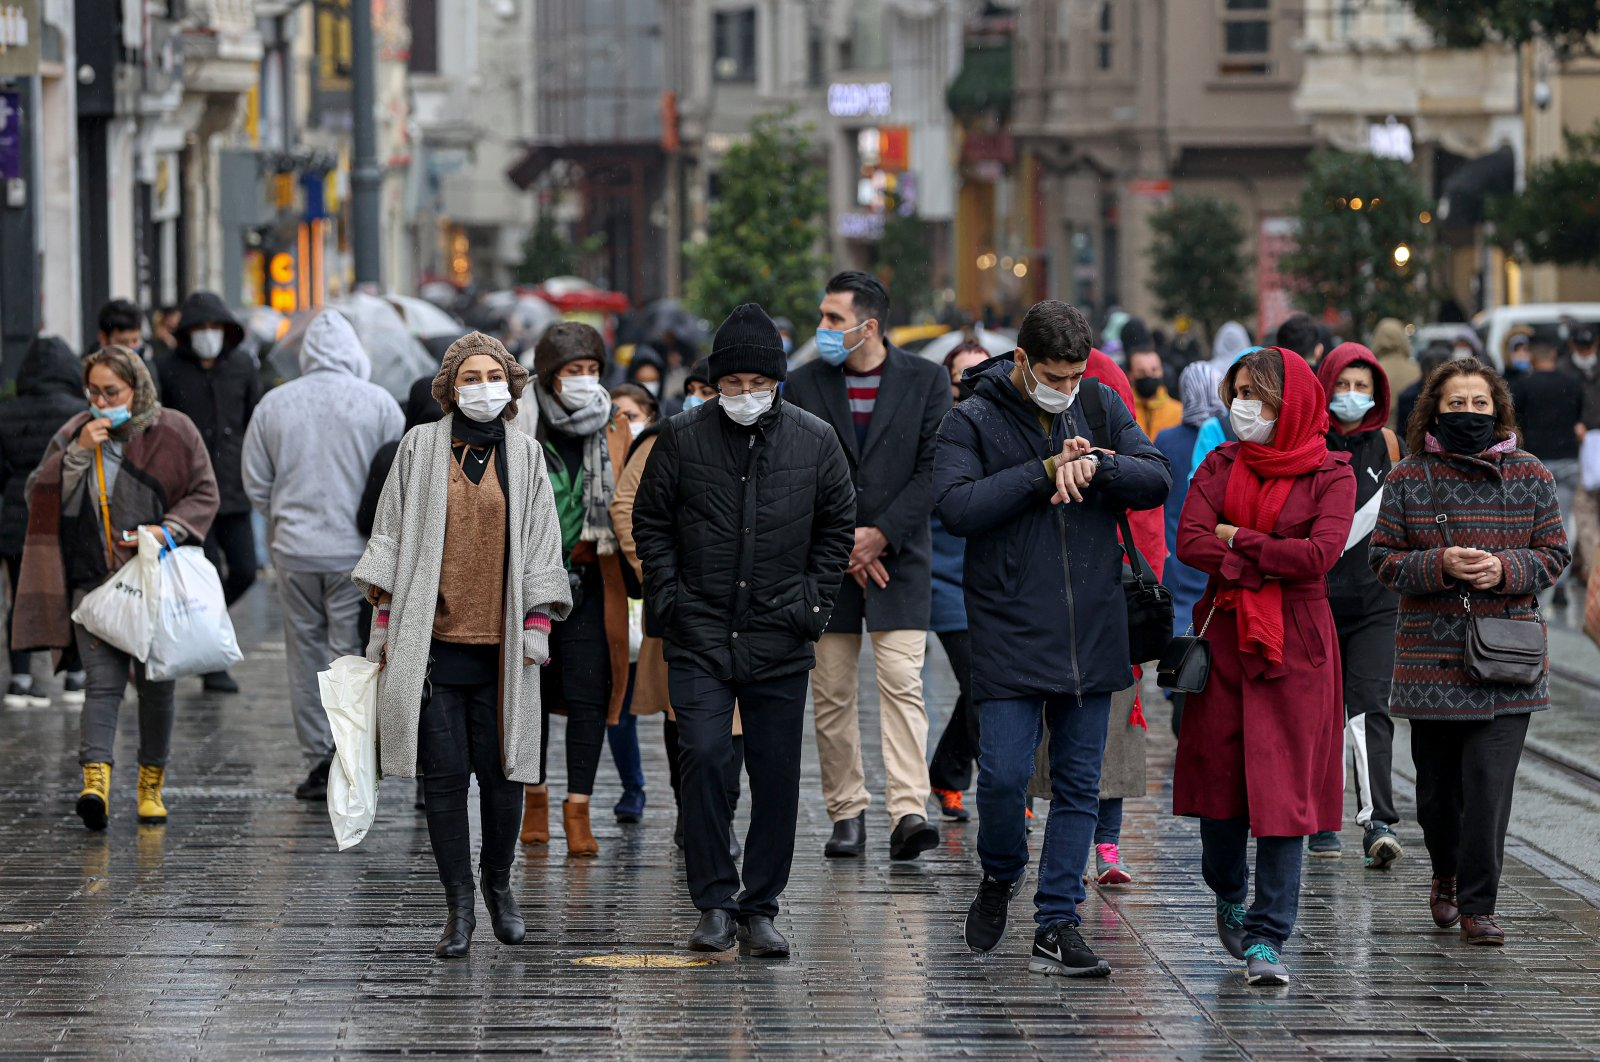 People walk on Istiklal Avenue in Istanbul, Turkey, Dec. 14, 2020. (AA PHOTO)